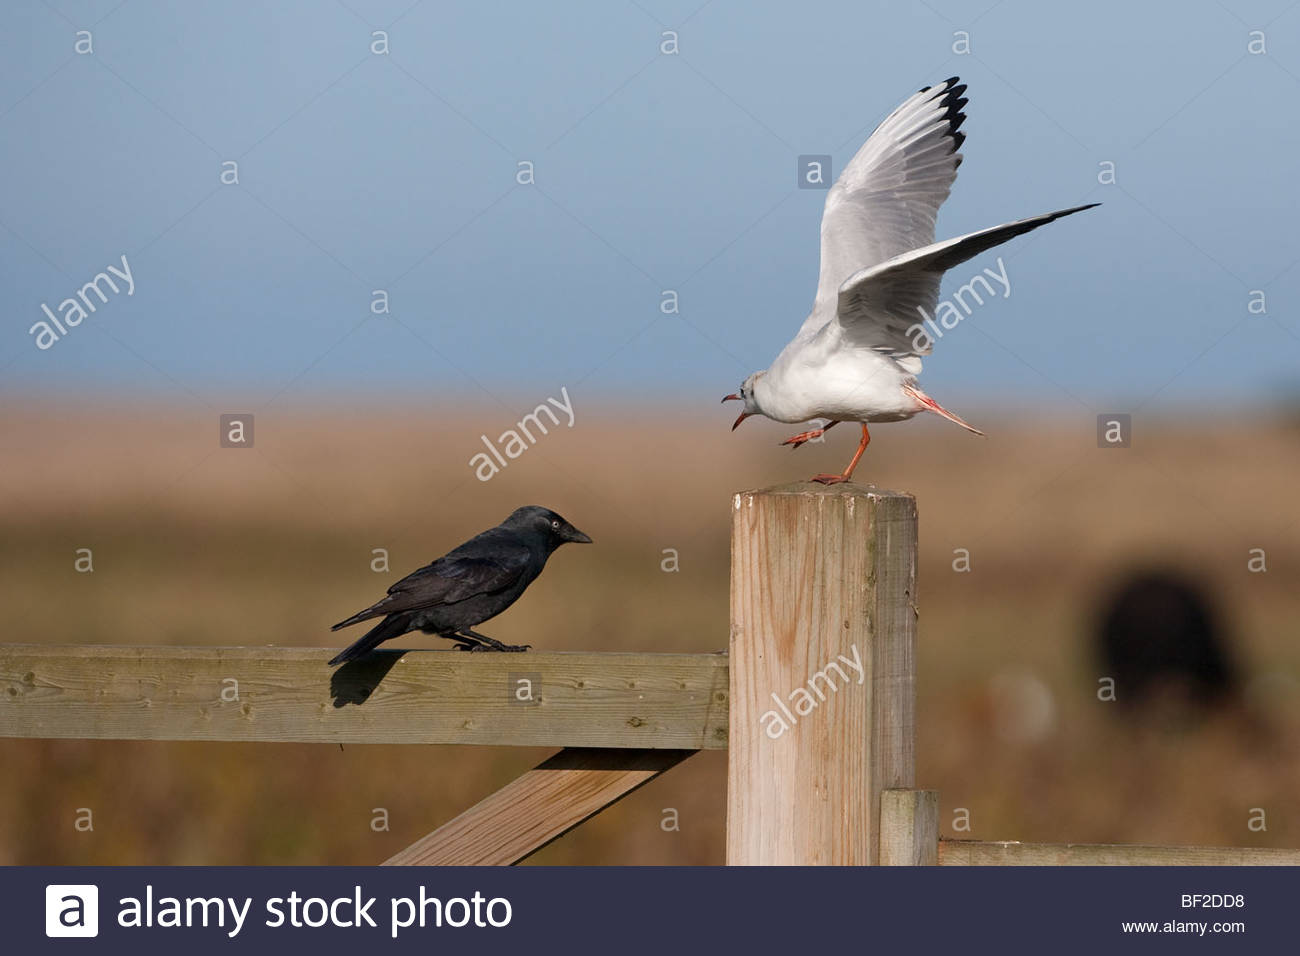 Jackdaw Corvus monedula harrassing Black-headed Gull with tail injury - Stock Image